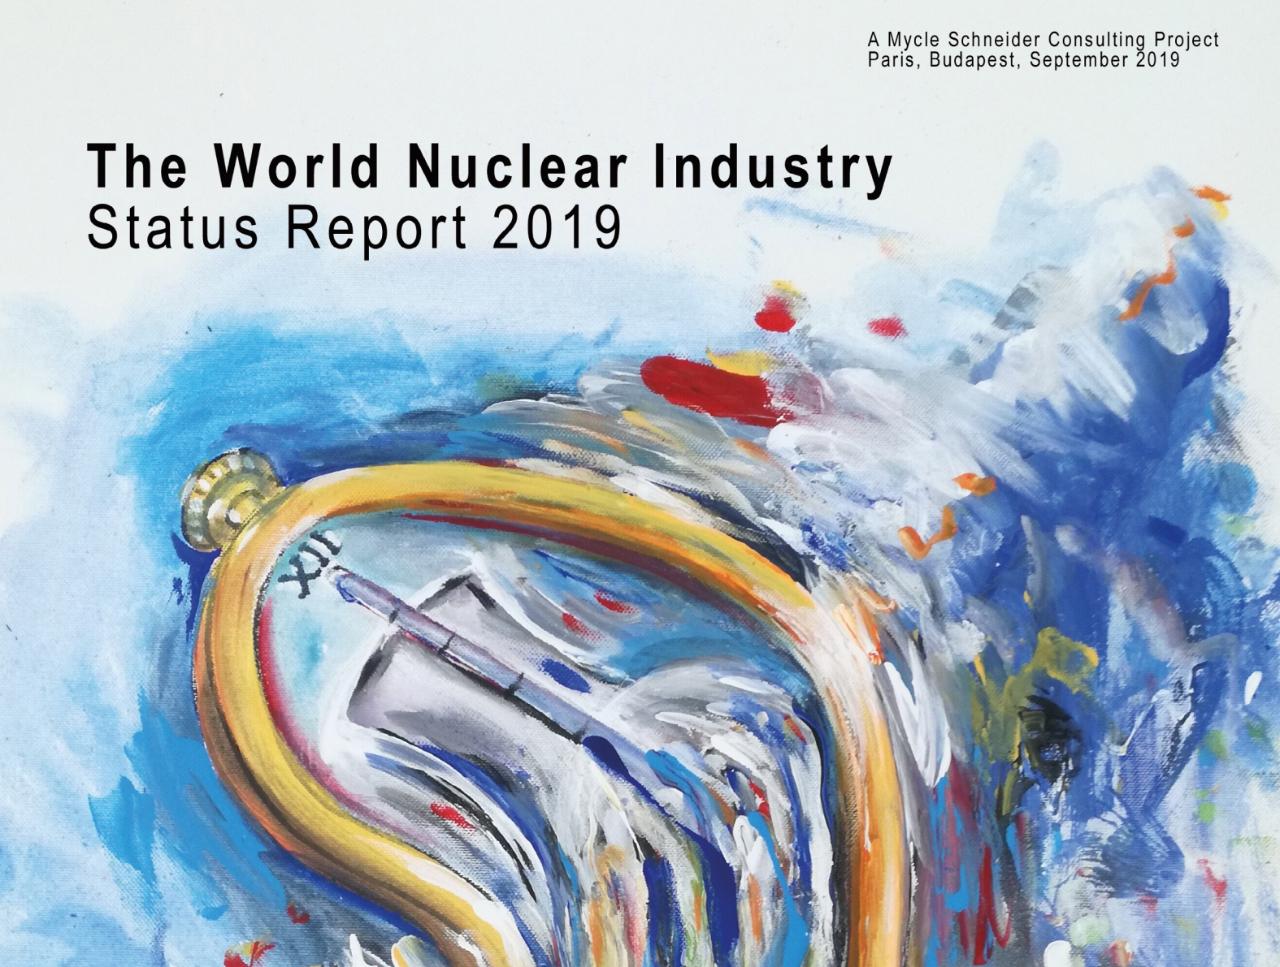 Präsentation des World Nuclear Industry Status Report 2019 in Brüssel